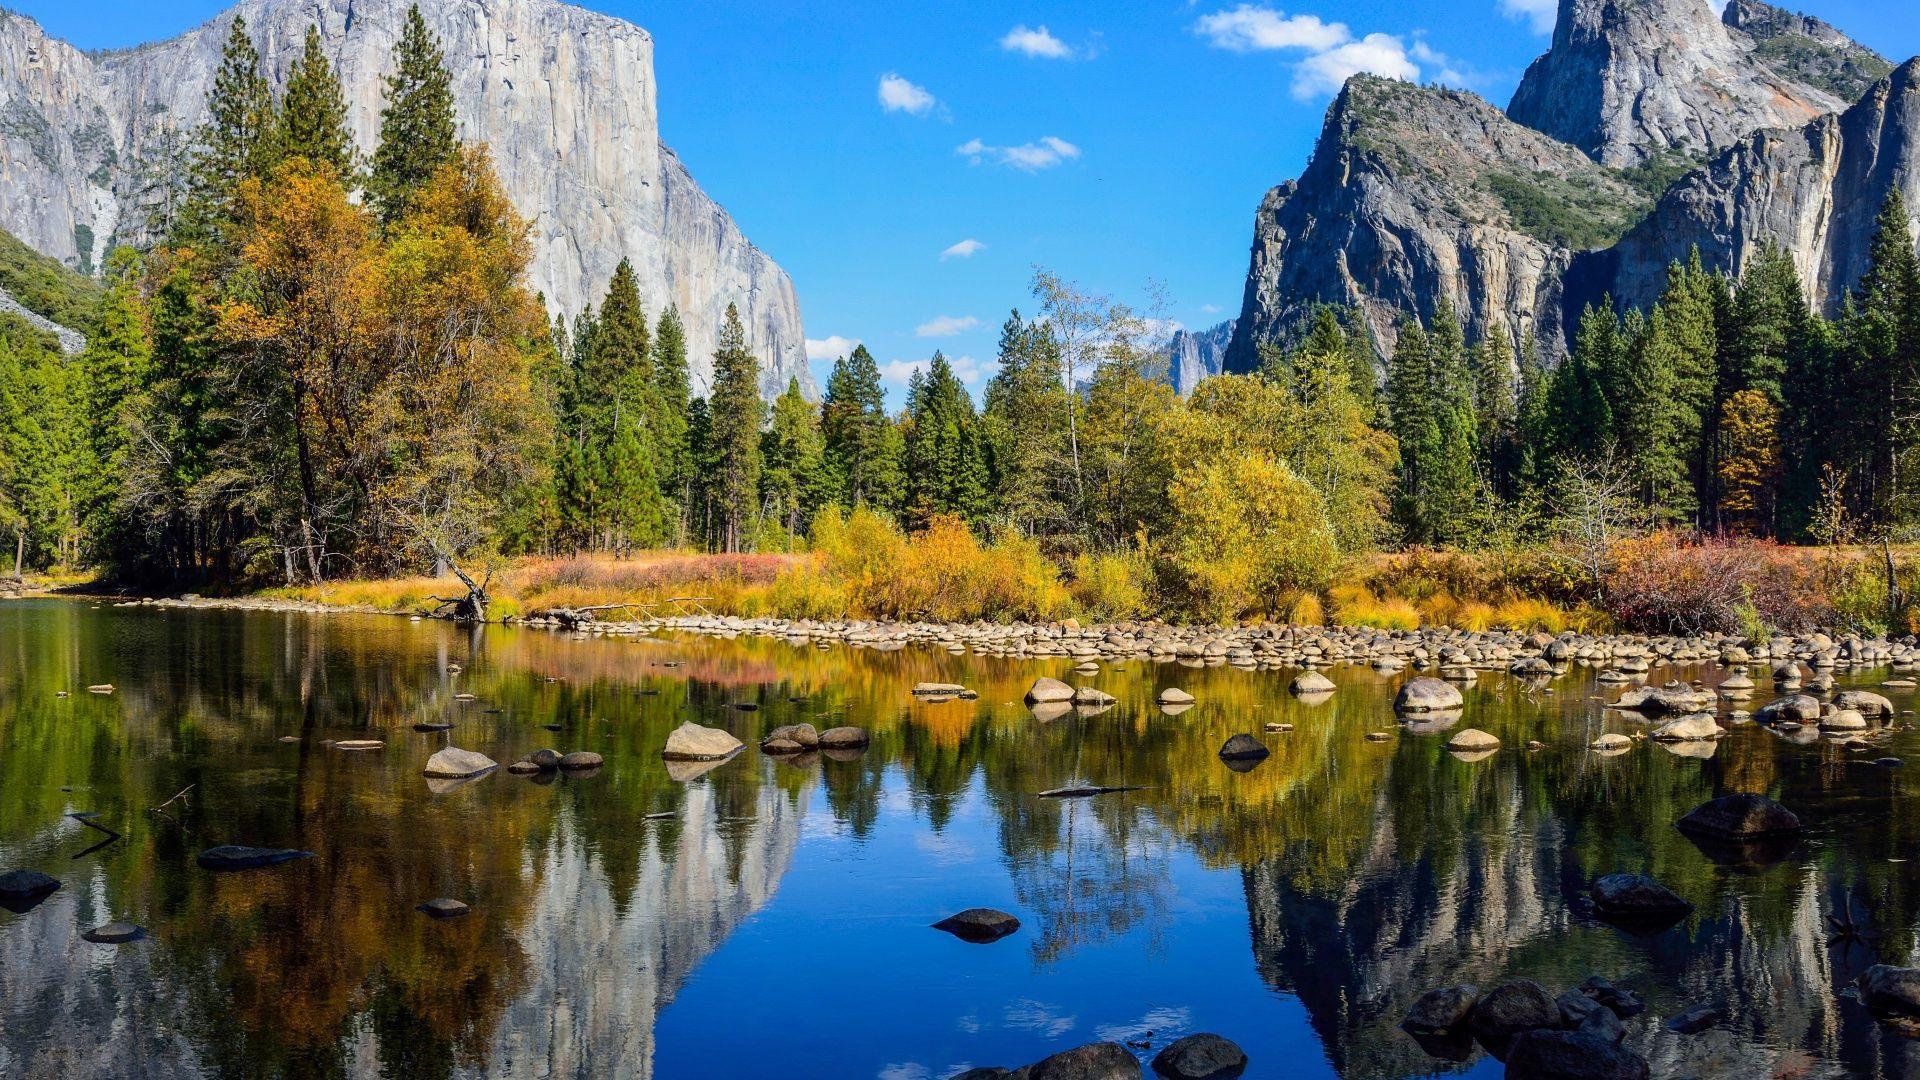 Yosemite background wallpaper